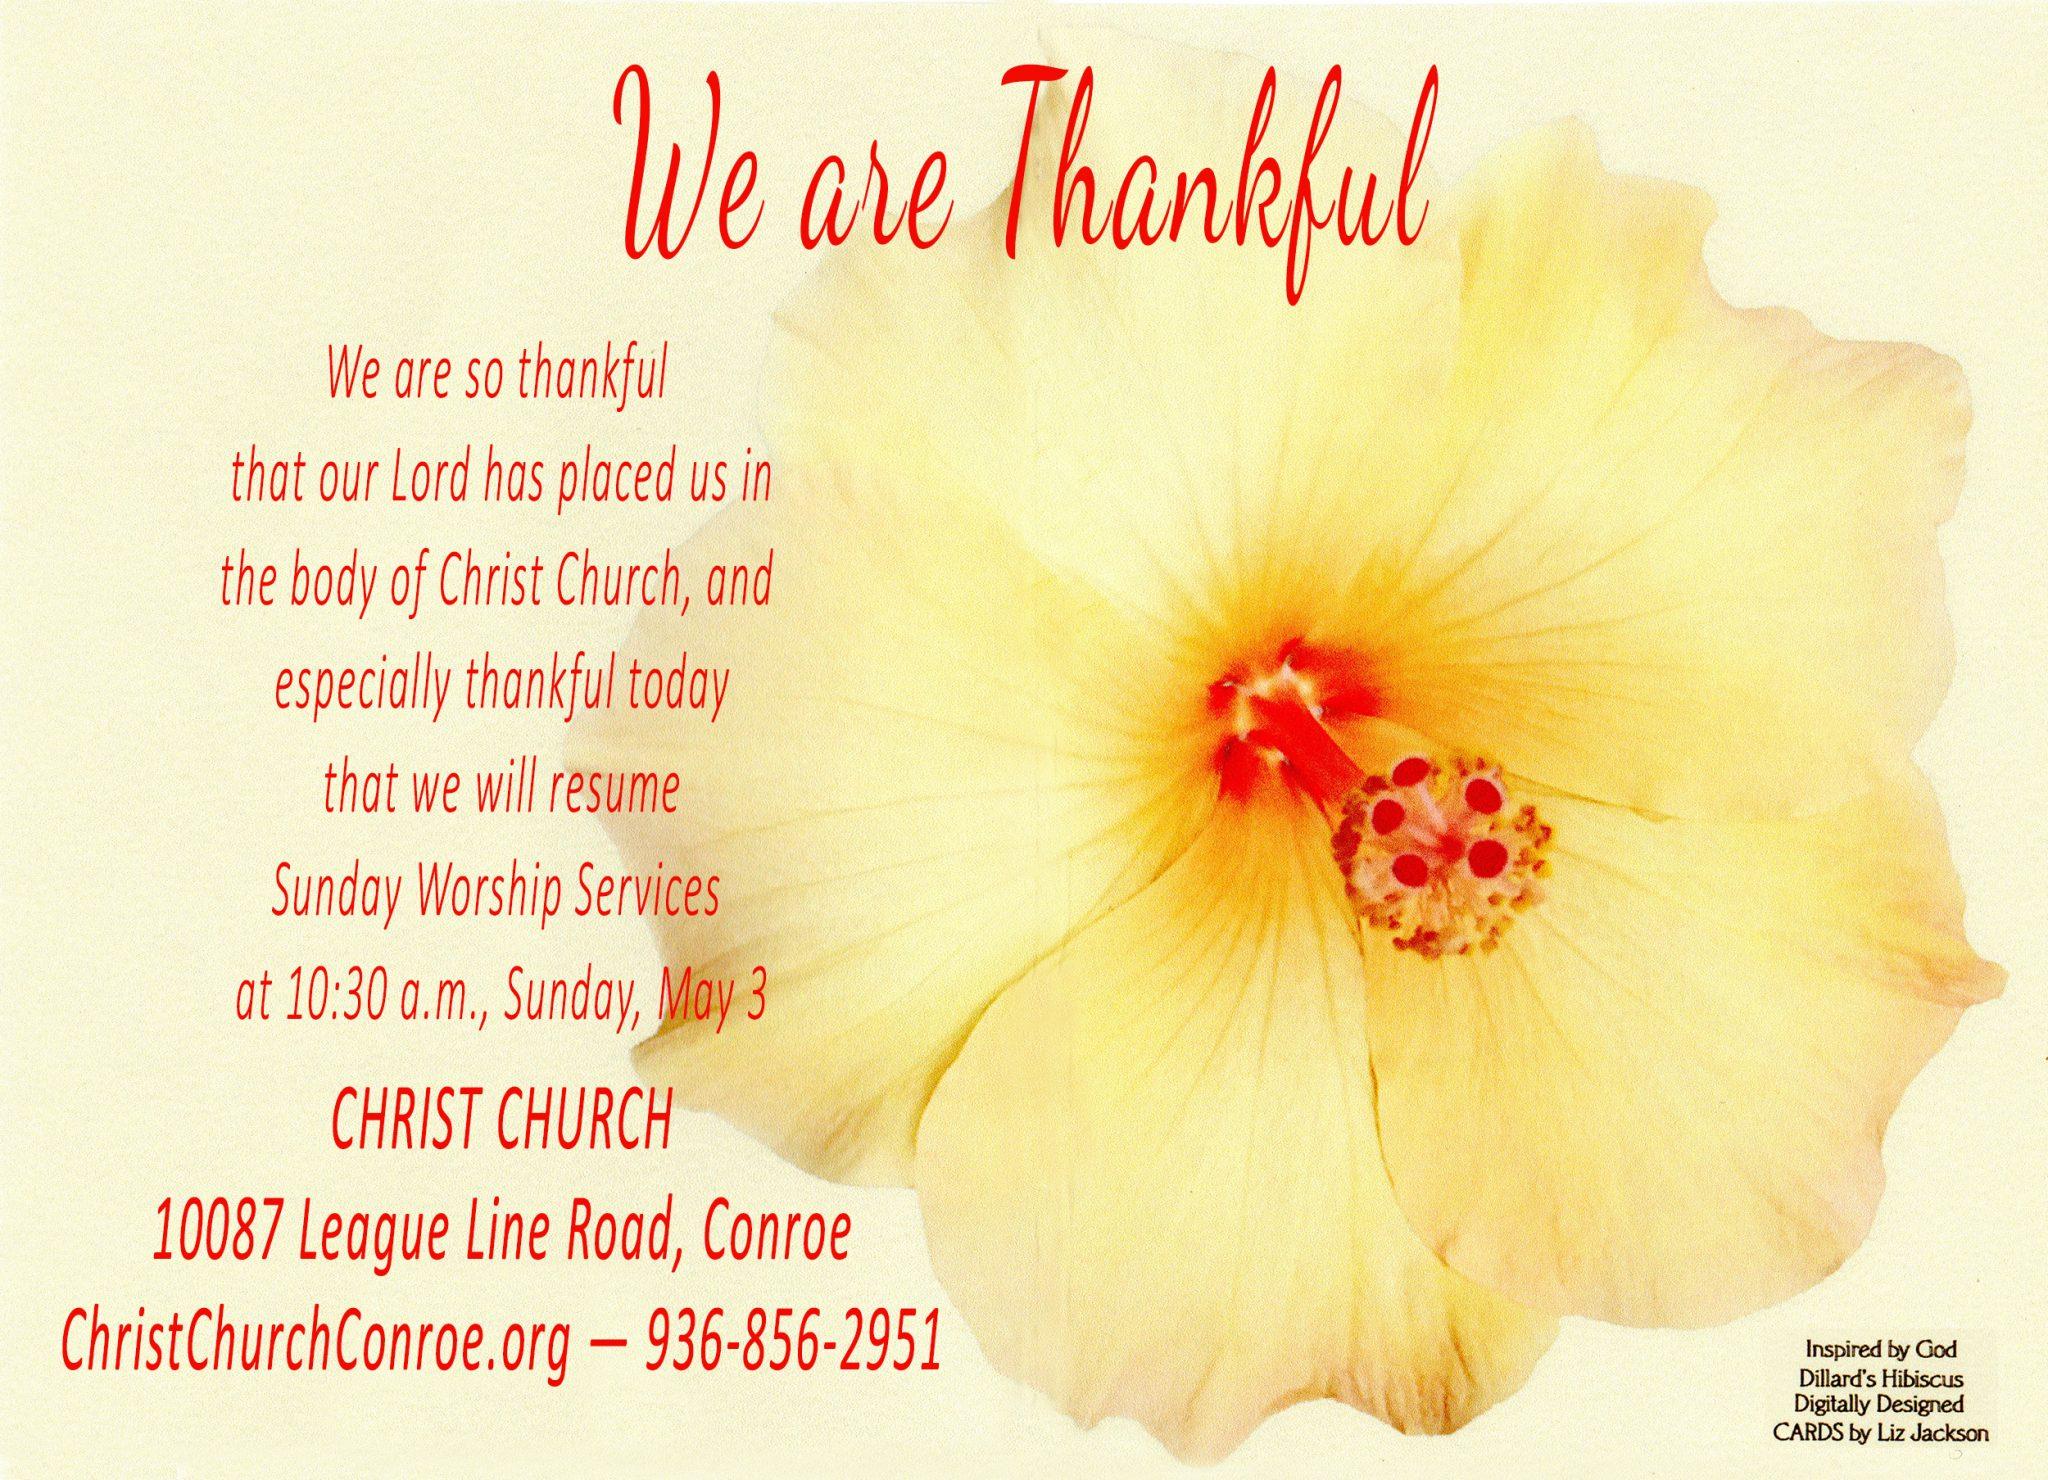 Christ Church, Conroe, resumes Worship Services, Sunday, May 3